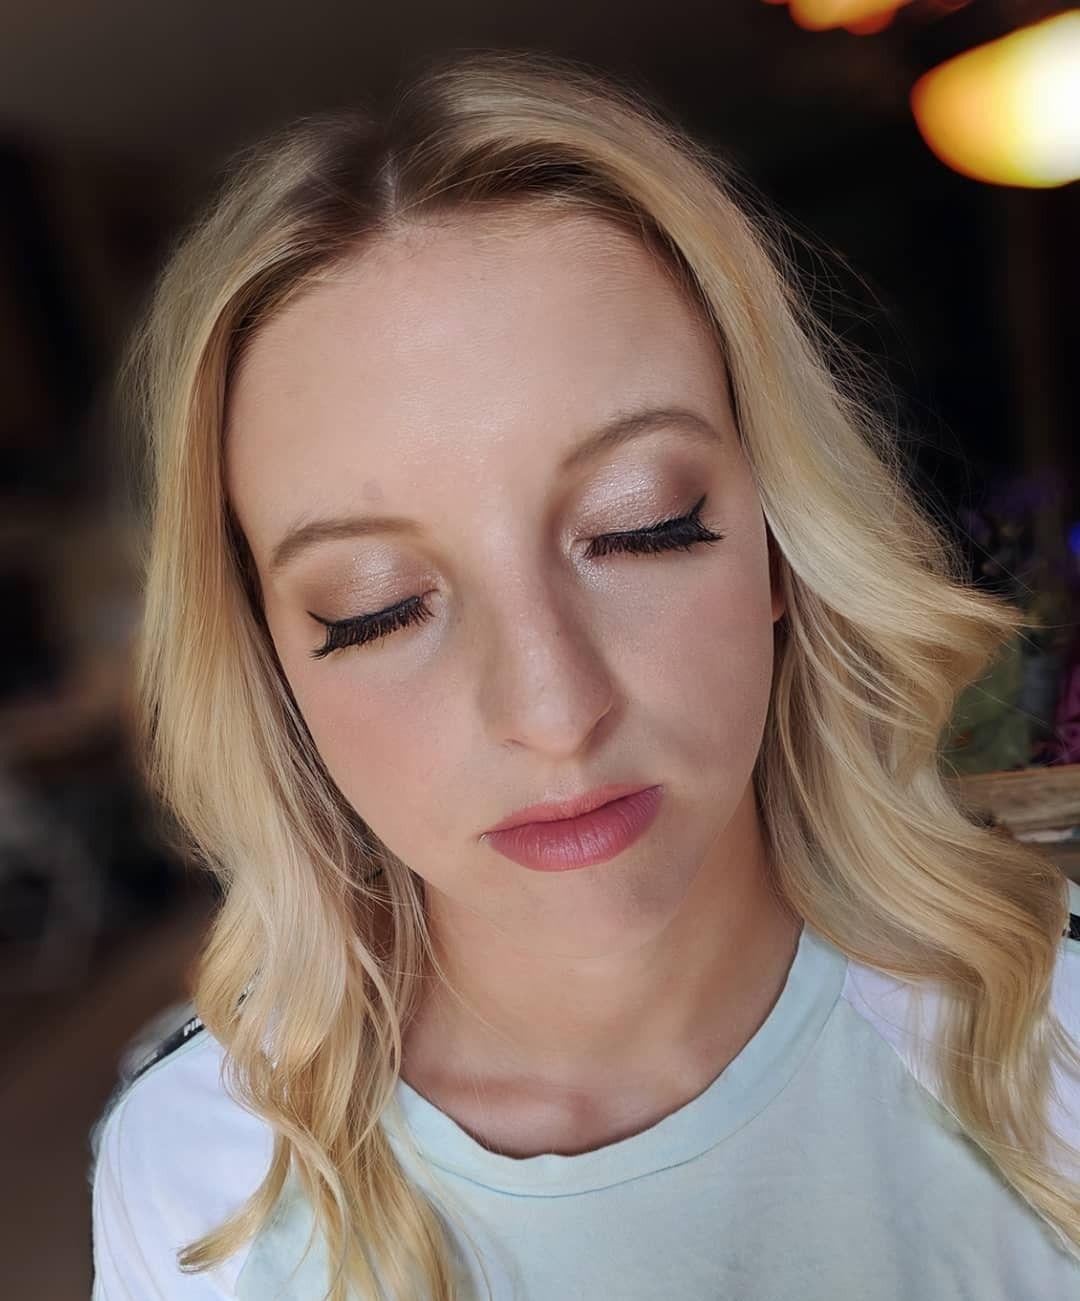 Natural makeup ideas. Senior picture makeup. Senior